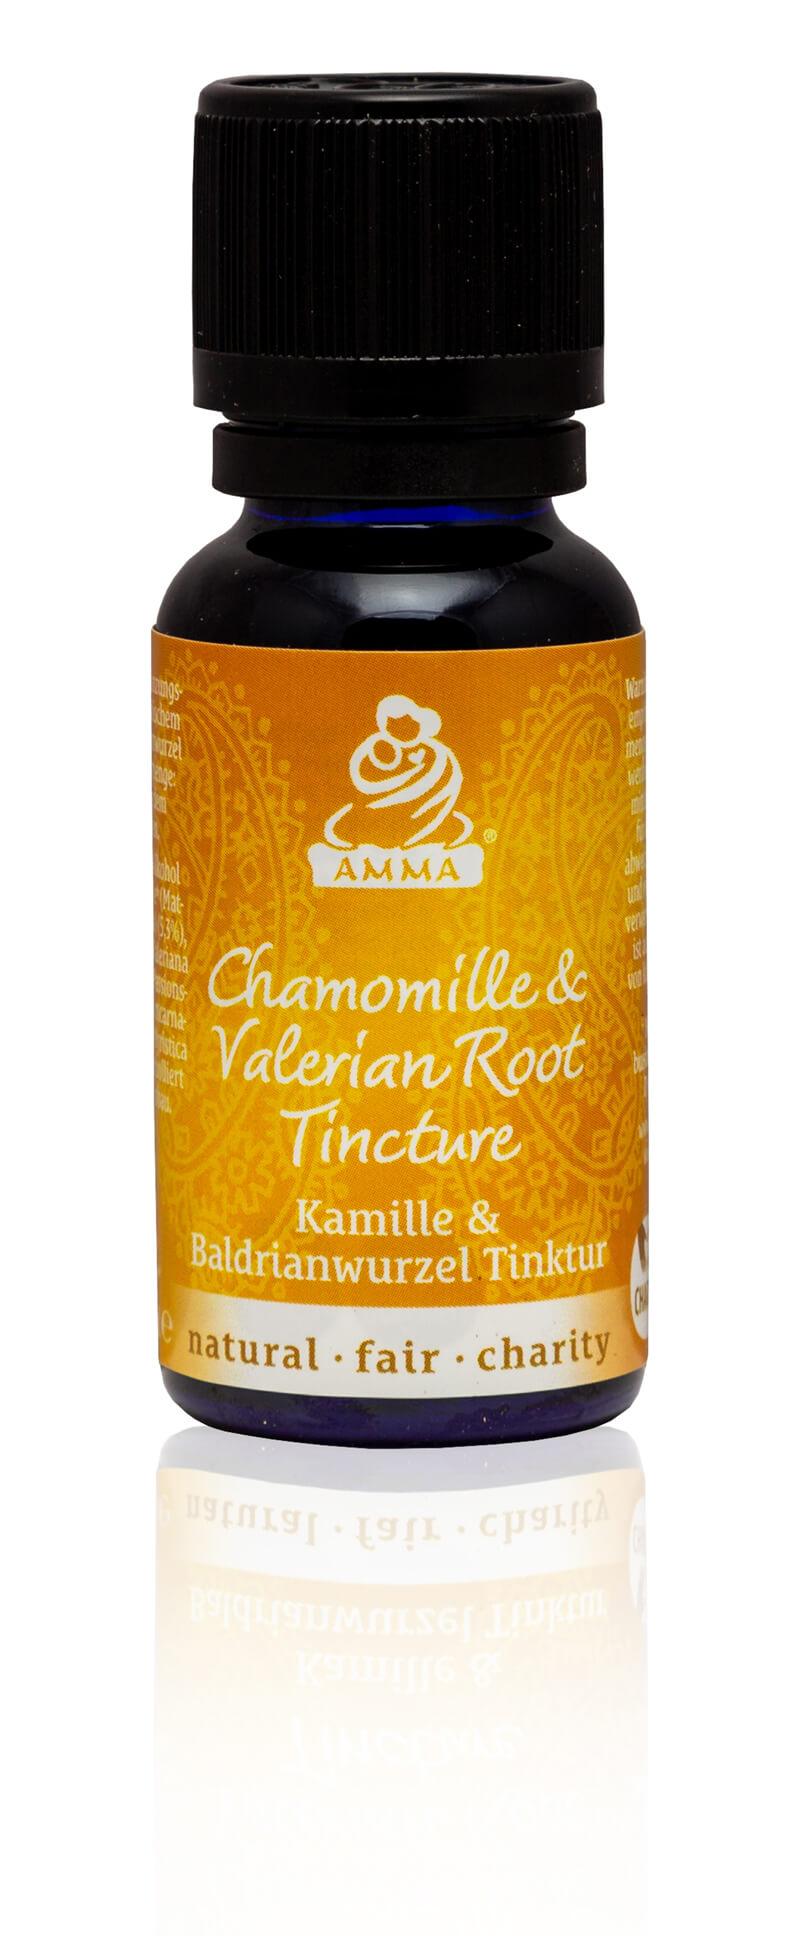 Chamomile & Valerian Root Tincture, organic